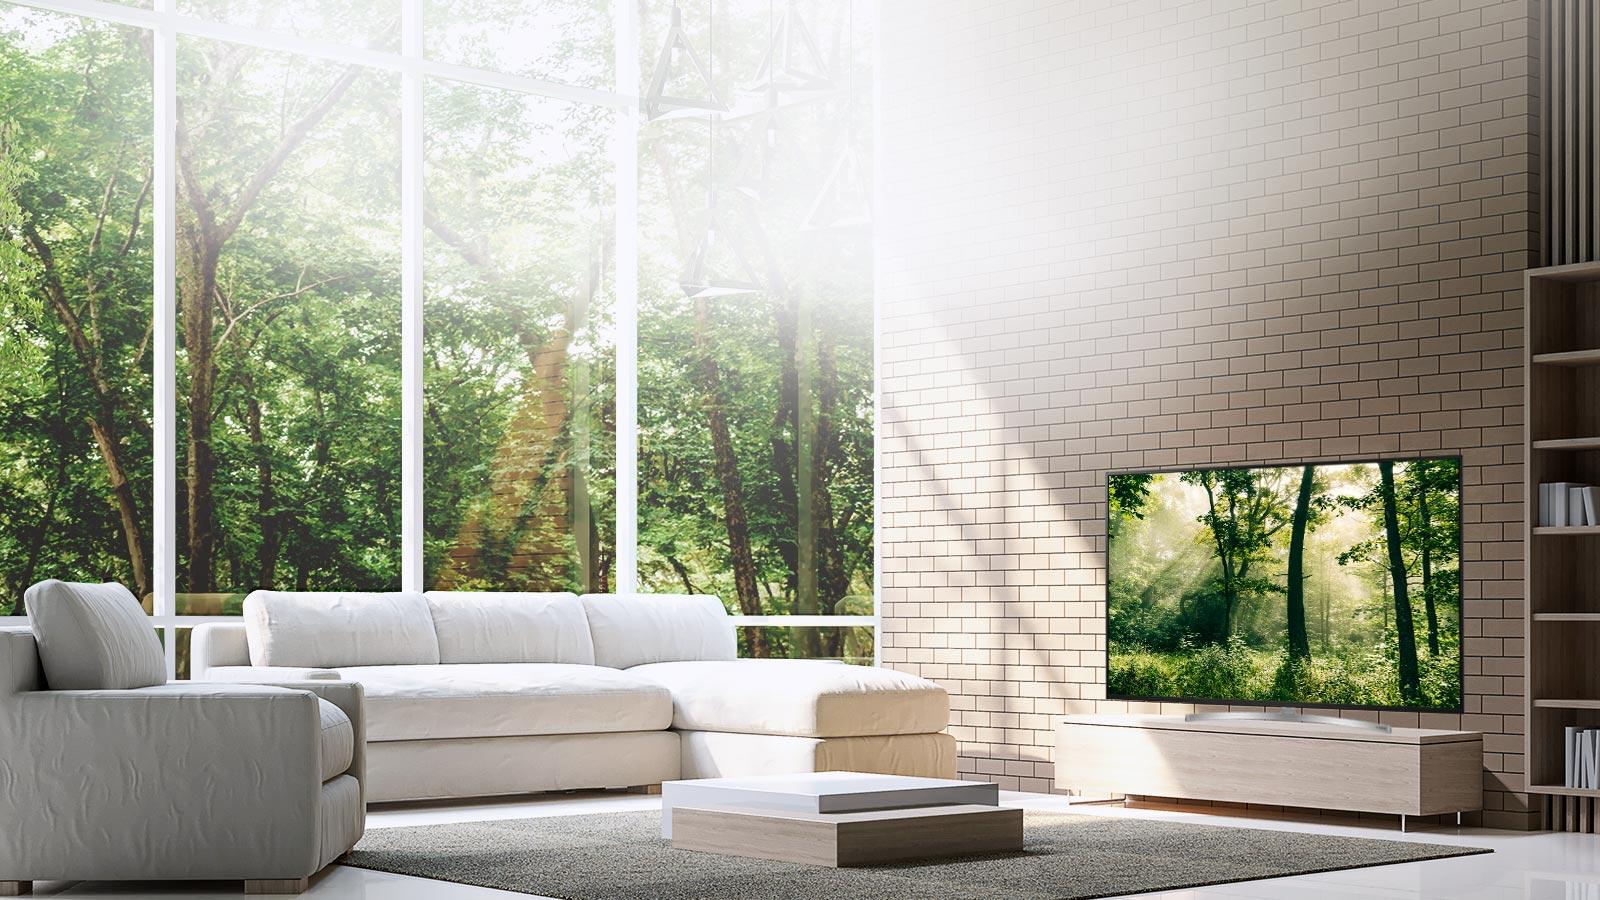 LG TV's - Boundless Cinema Screen